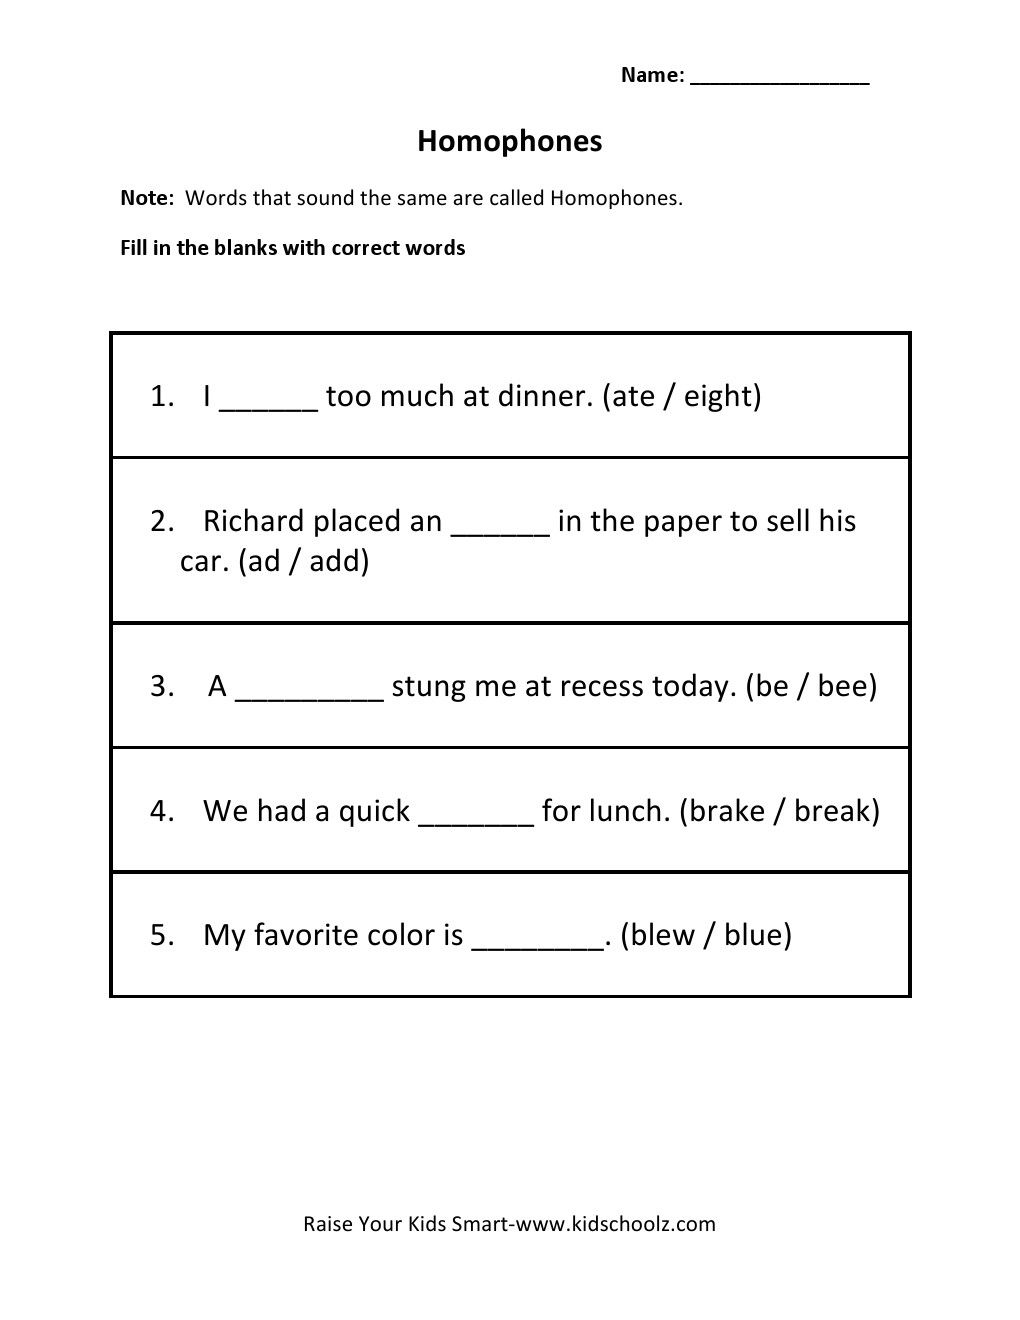 small resolution of www.kidschoolz.com wp-content uploads 2014 09 homophones-1.jpg   2nd grade  worksheets